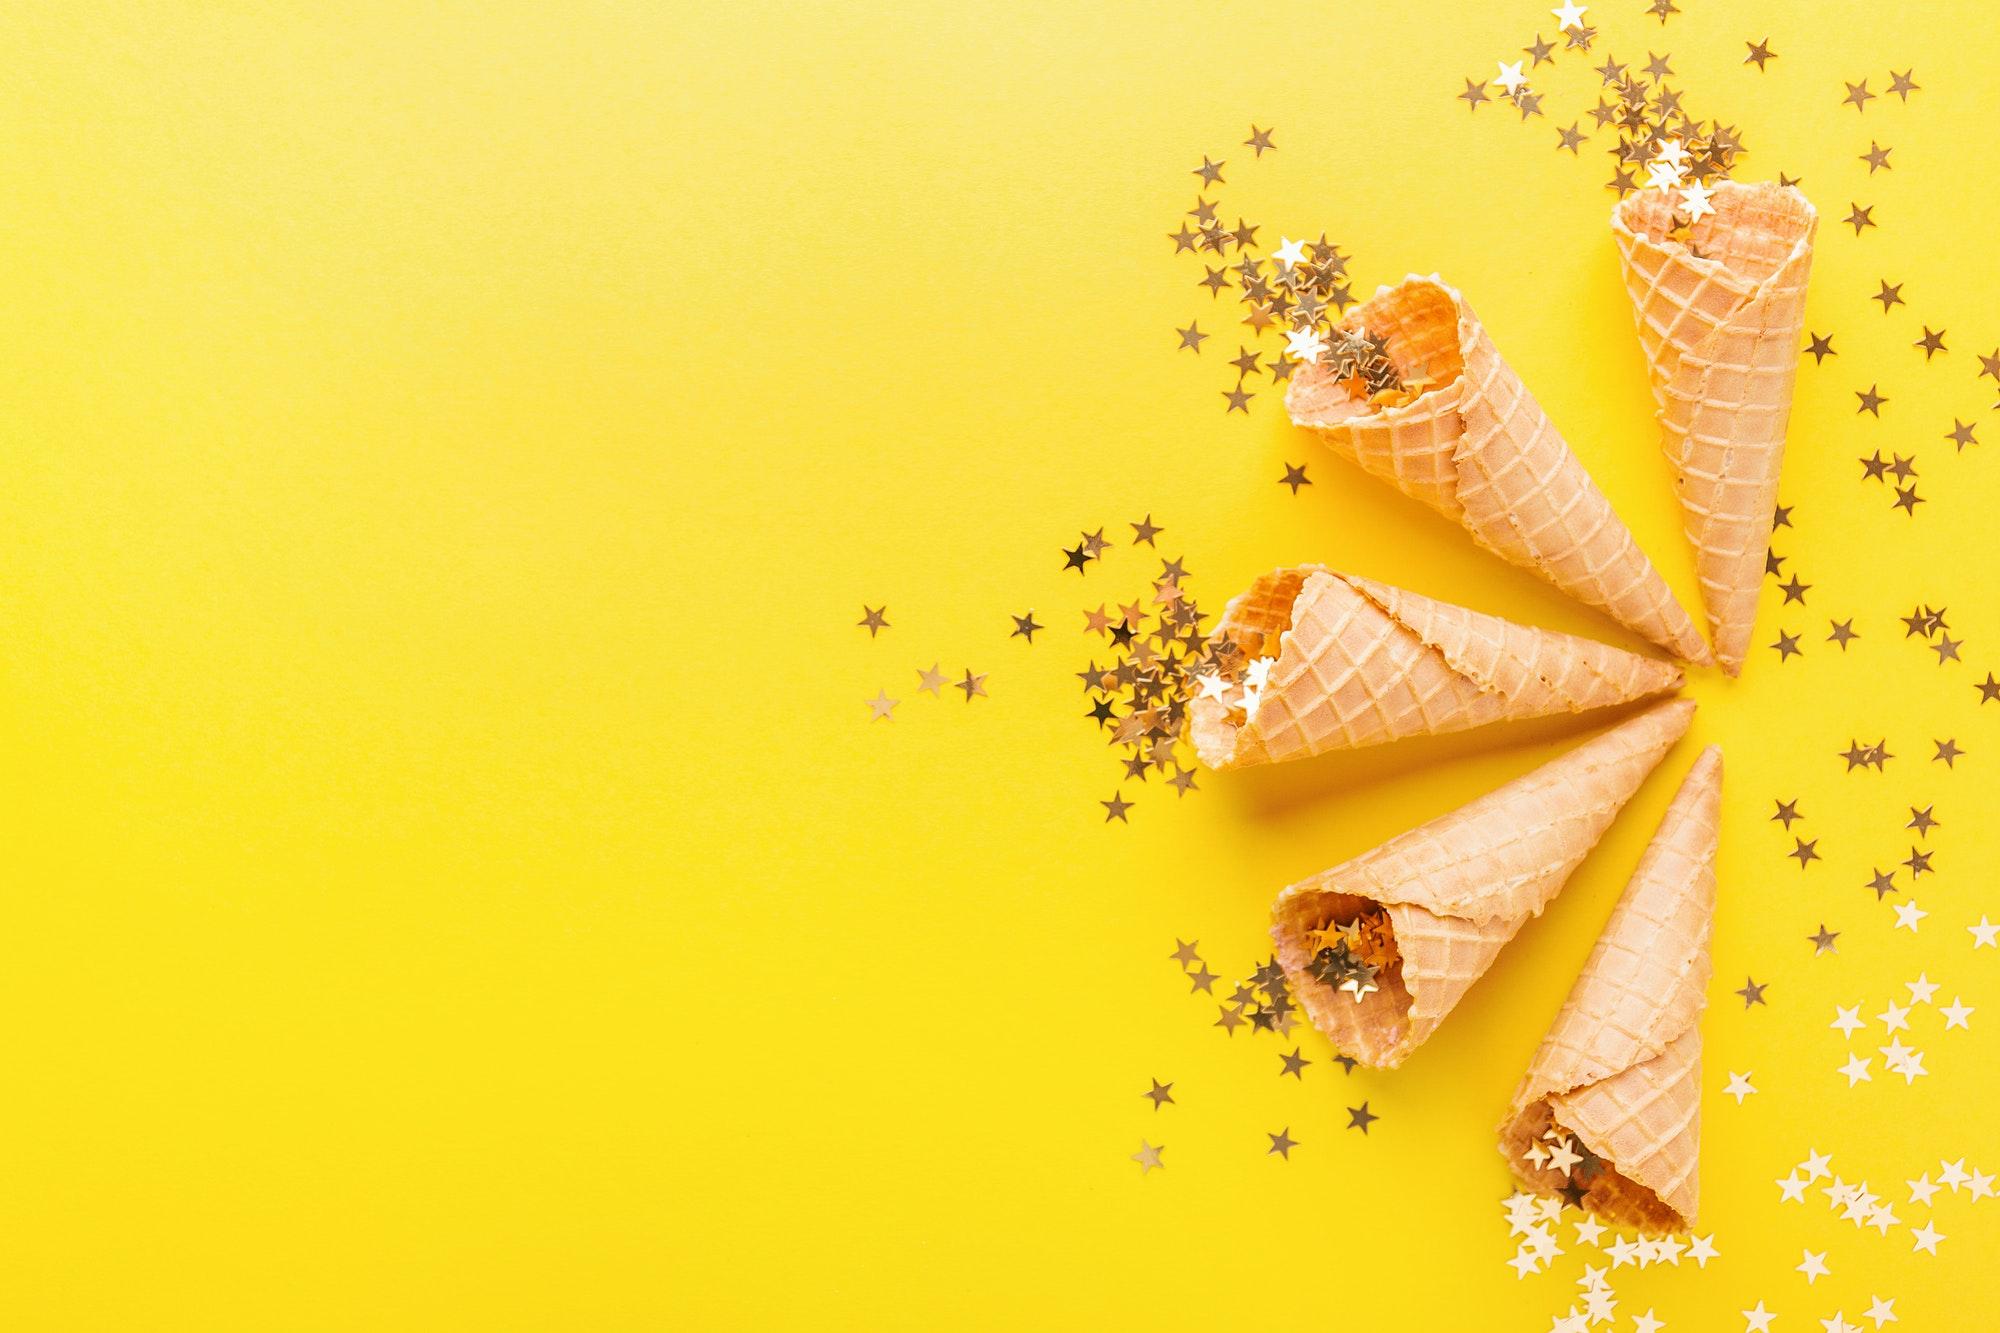 Ice cream cones with golden stars